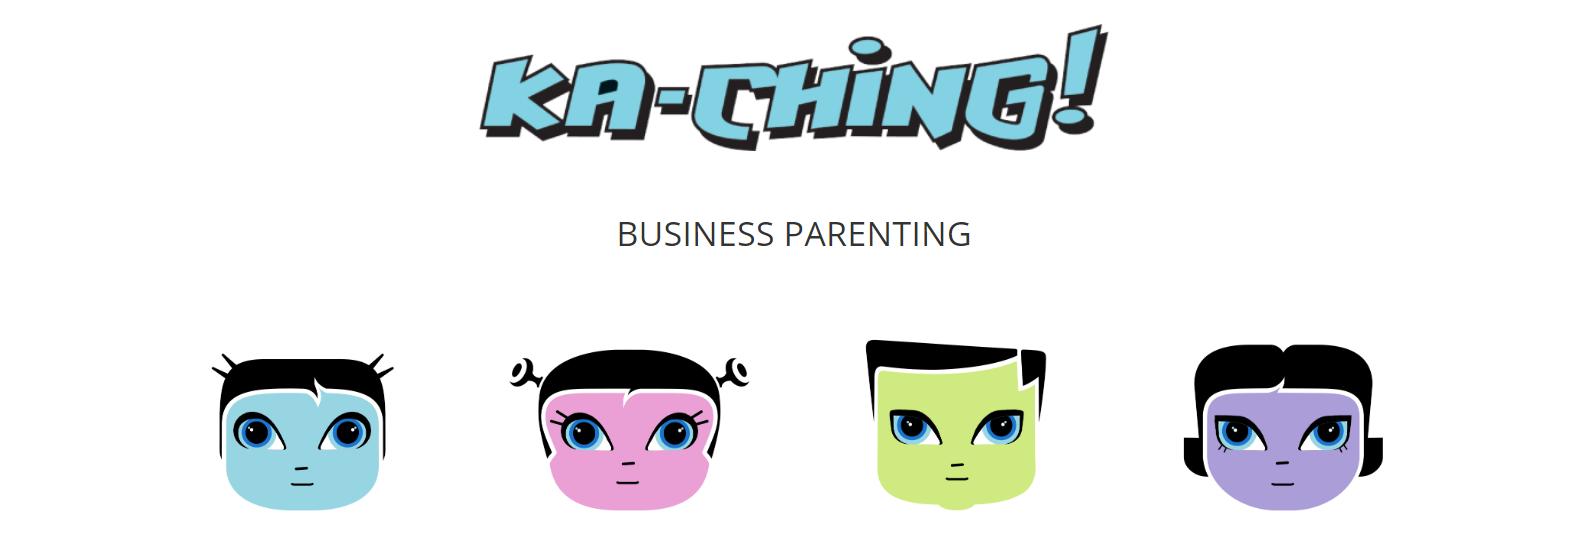 ka-ching! teach kids money skills